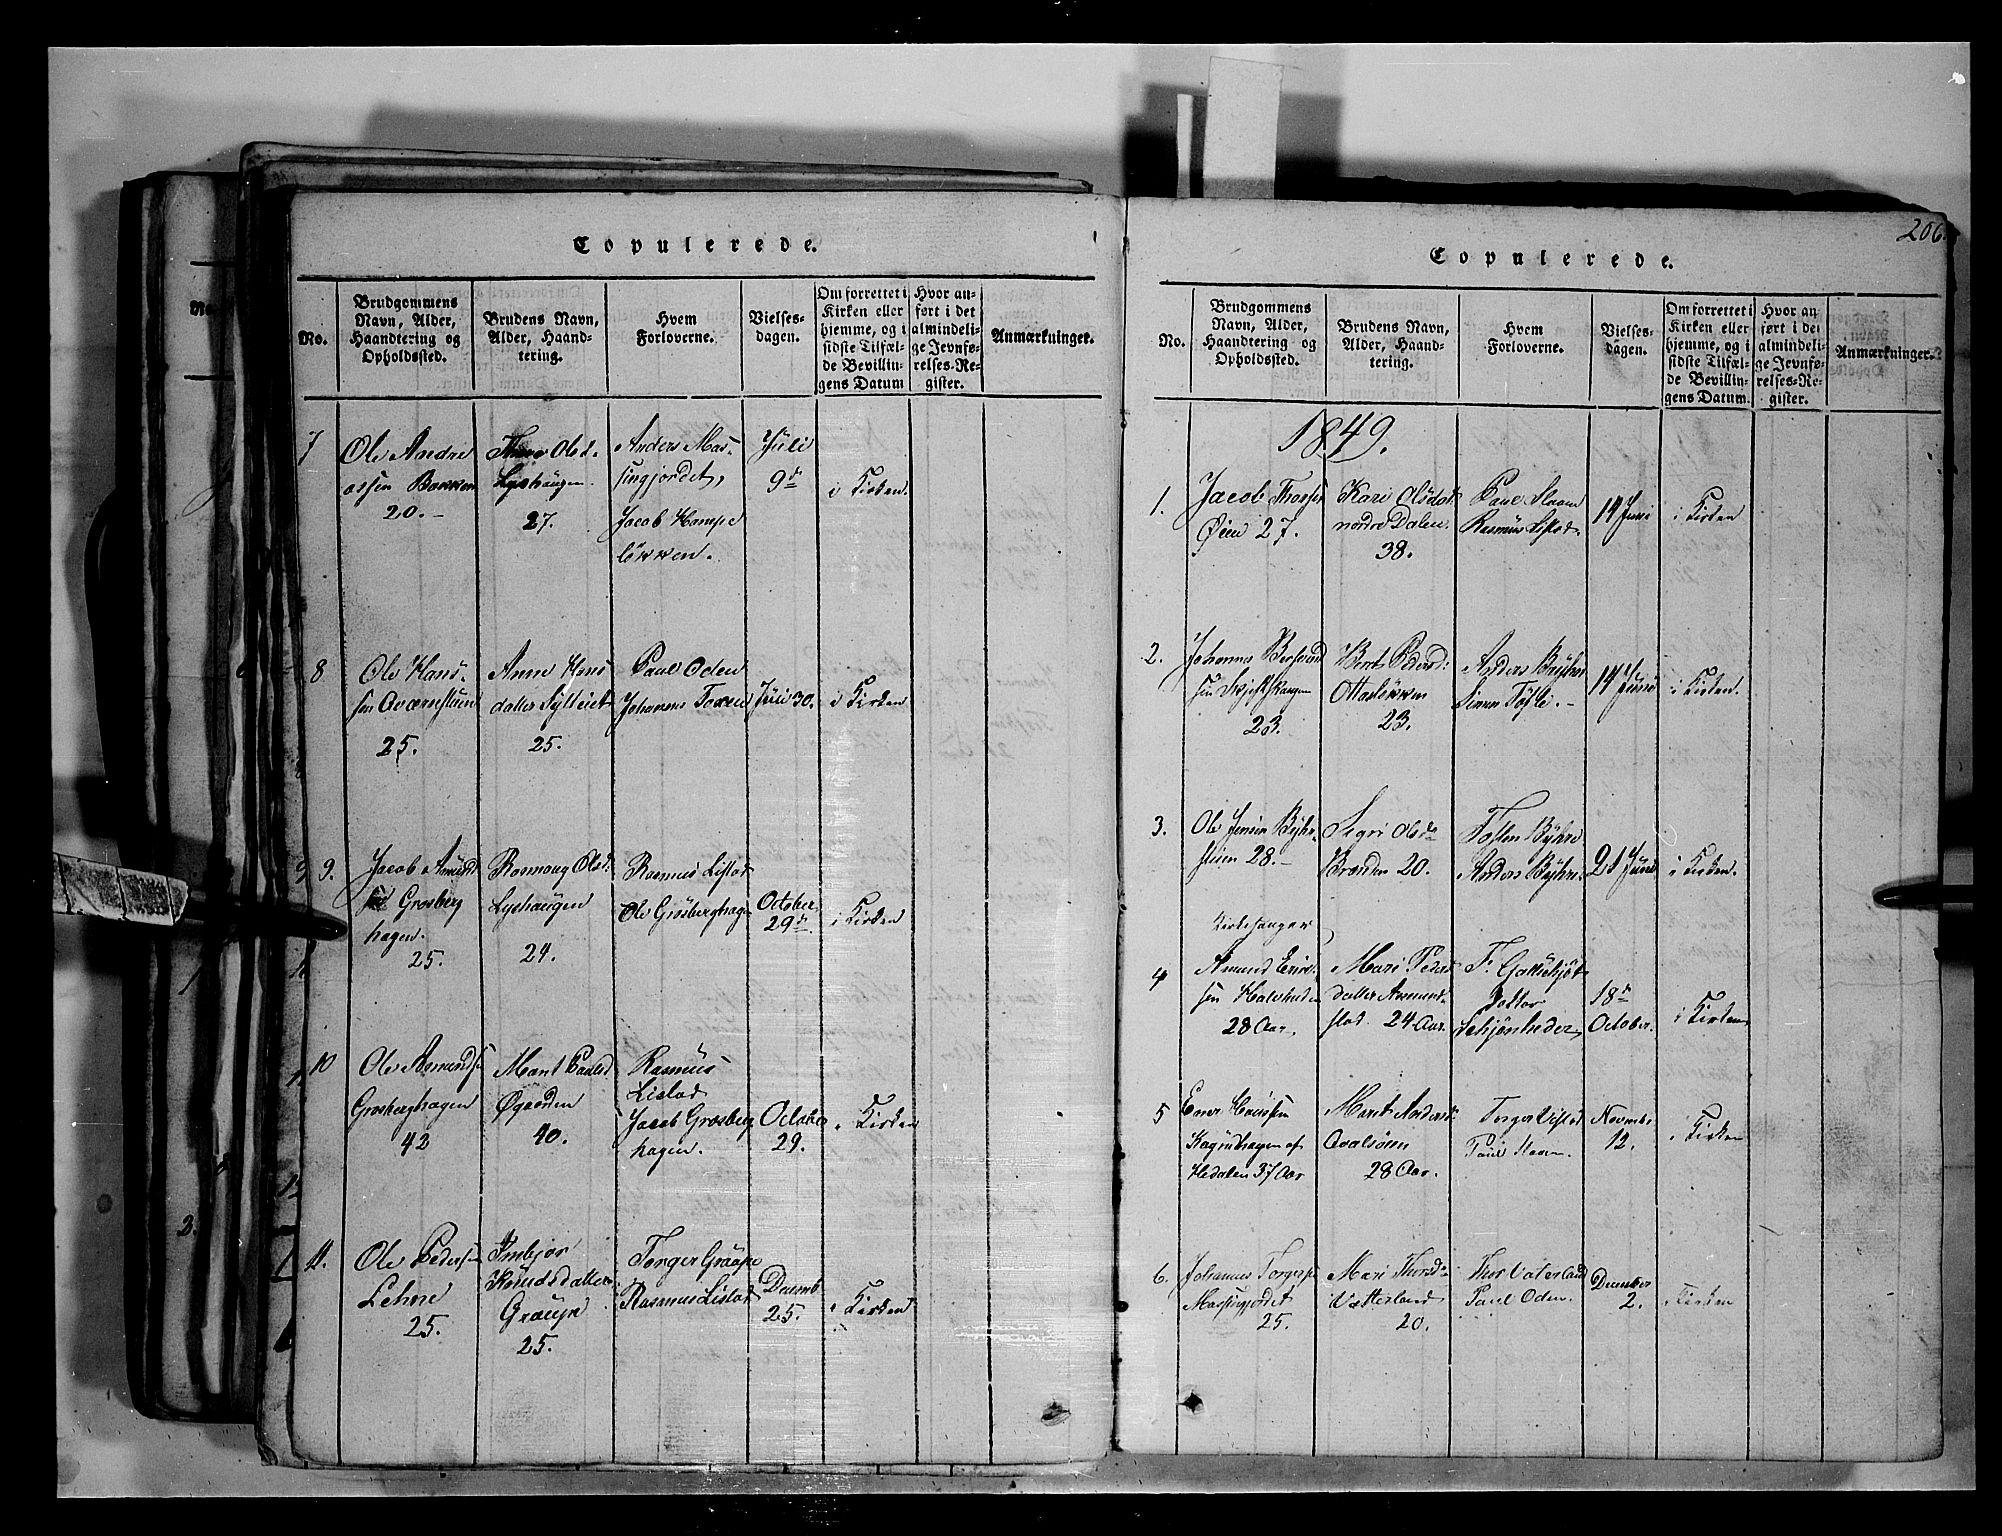 SAH, Fron prestekontor, H/Ha/Hab/L0003: Klokkerbok nr. 3, 1816-1850, s. 206